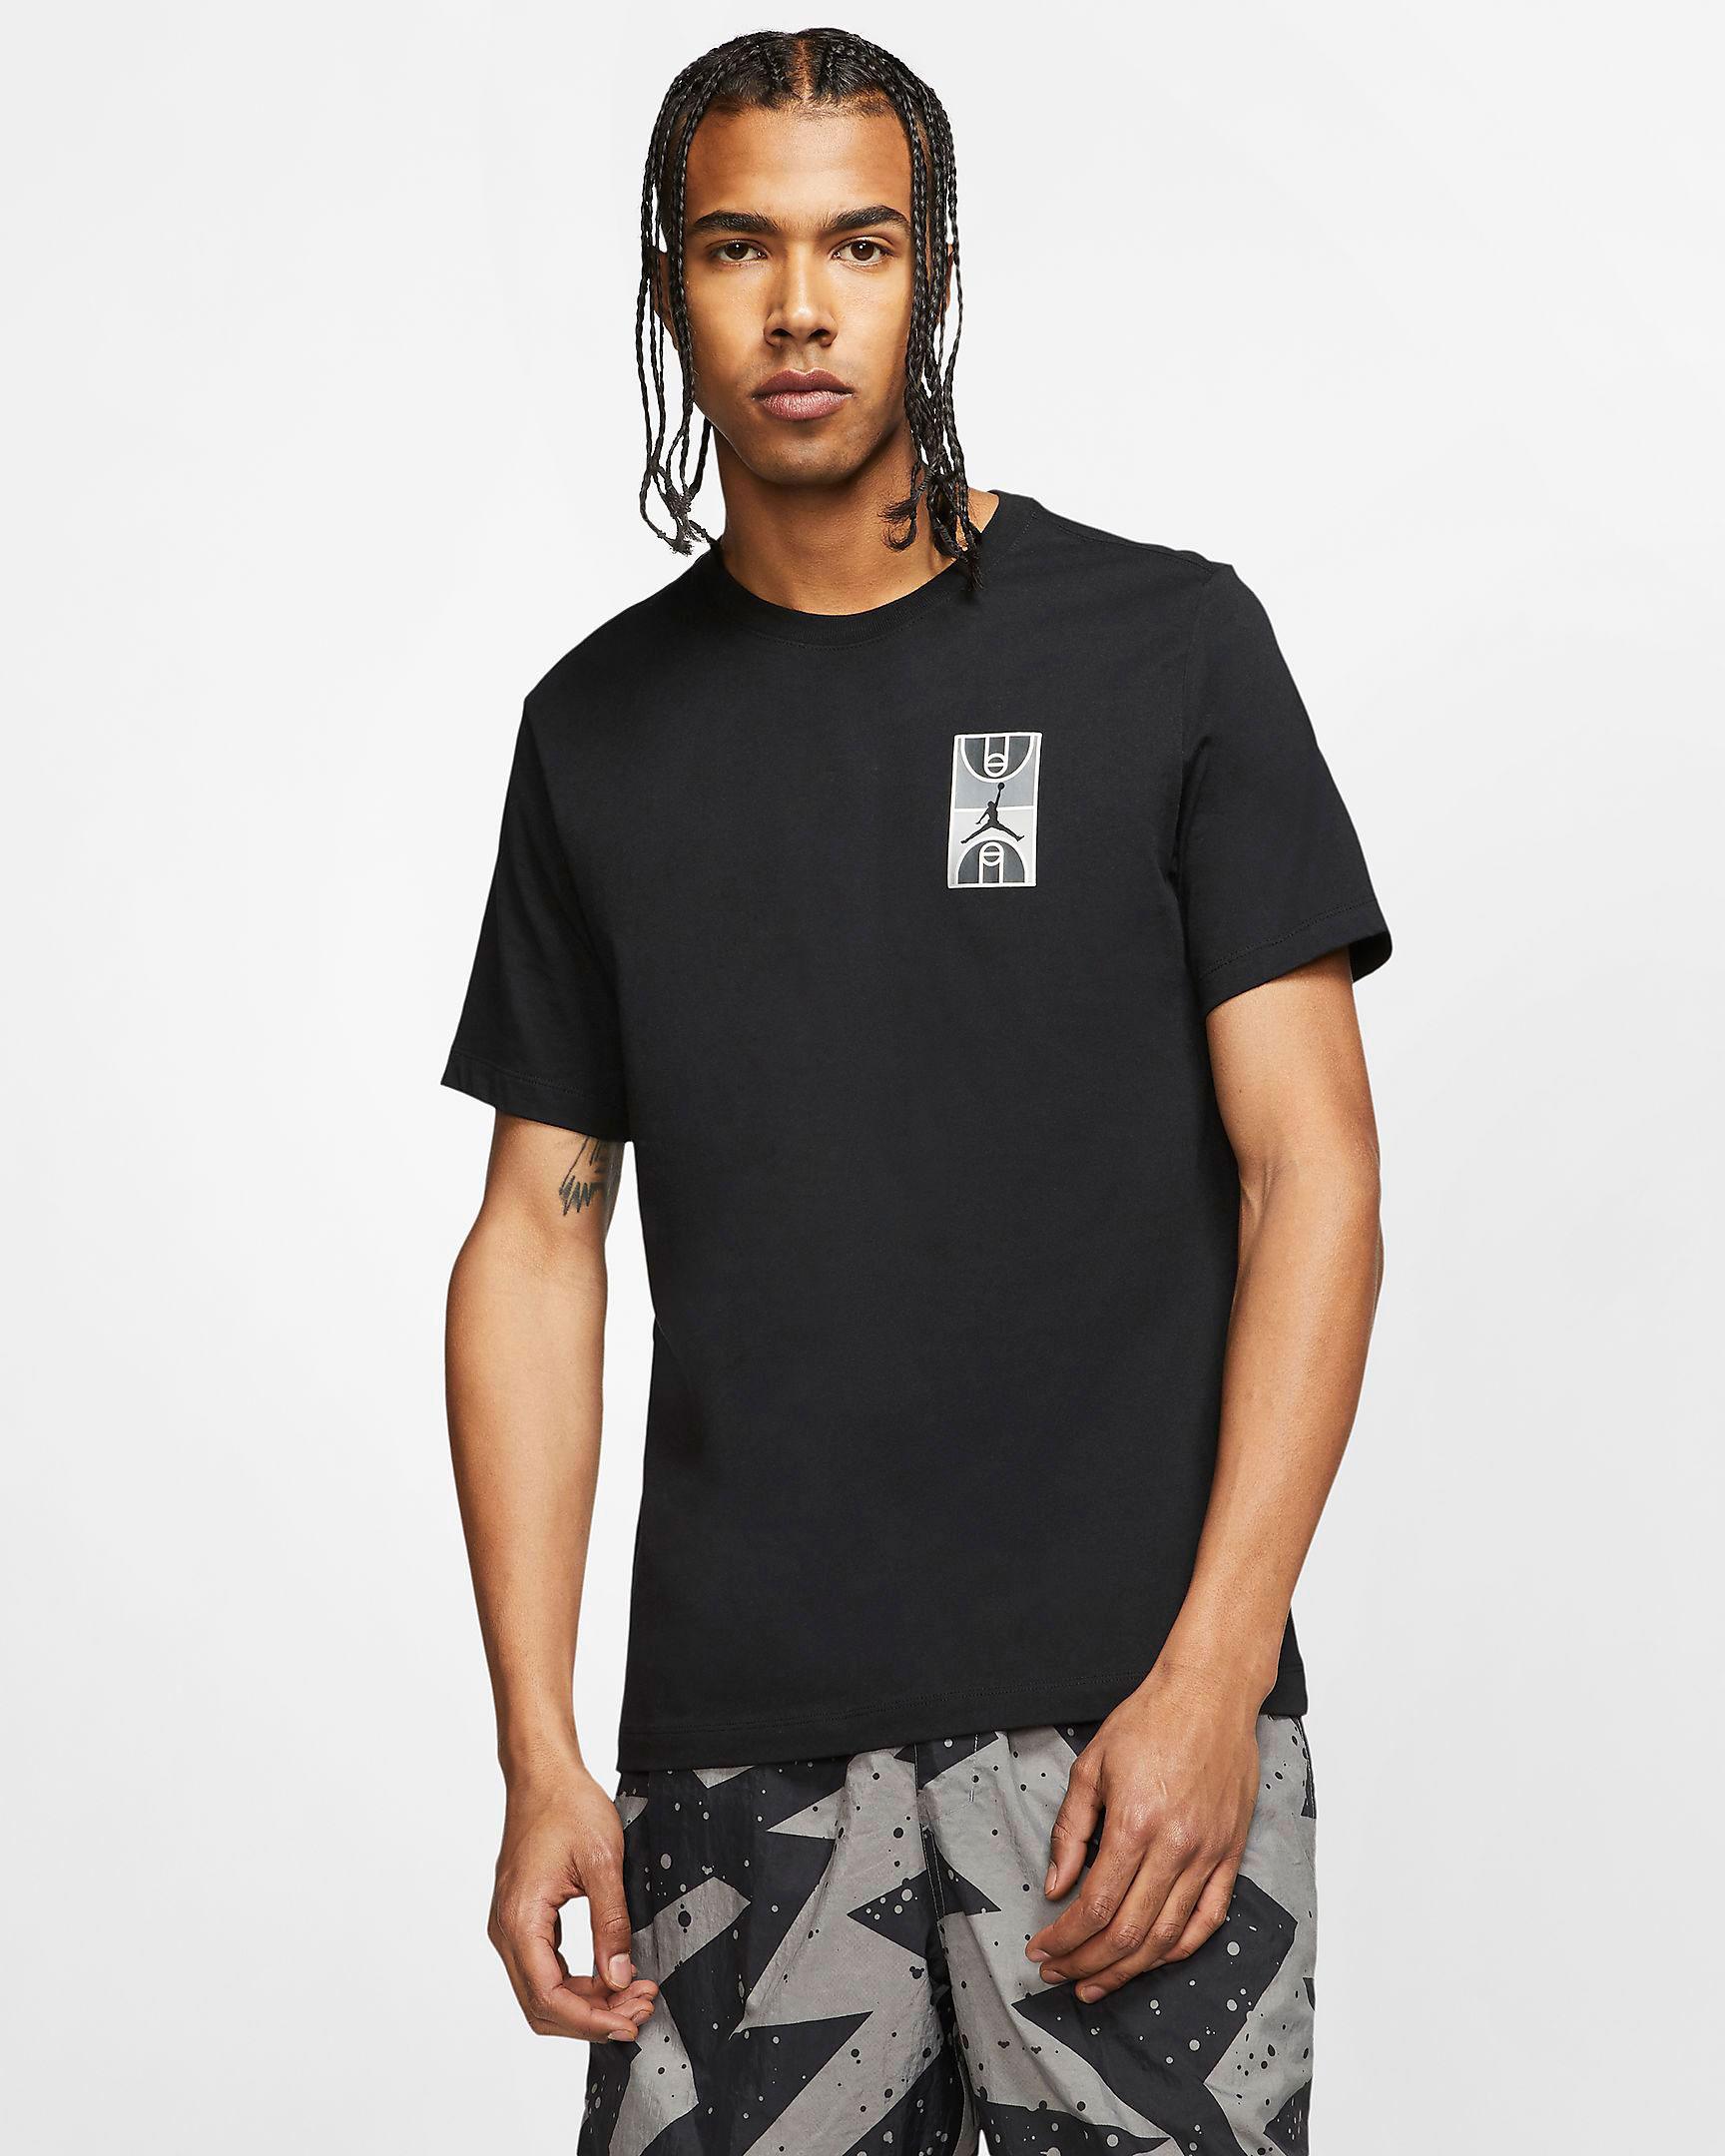 jordan-11-low-black-cement-shirt-match-4